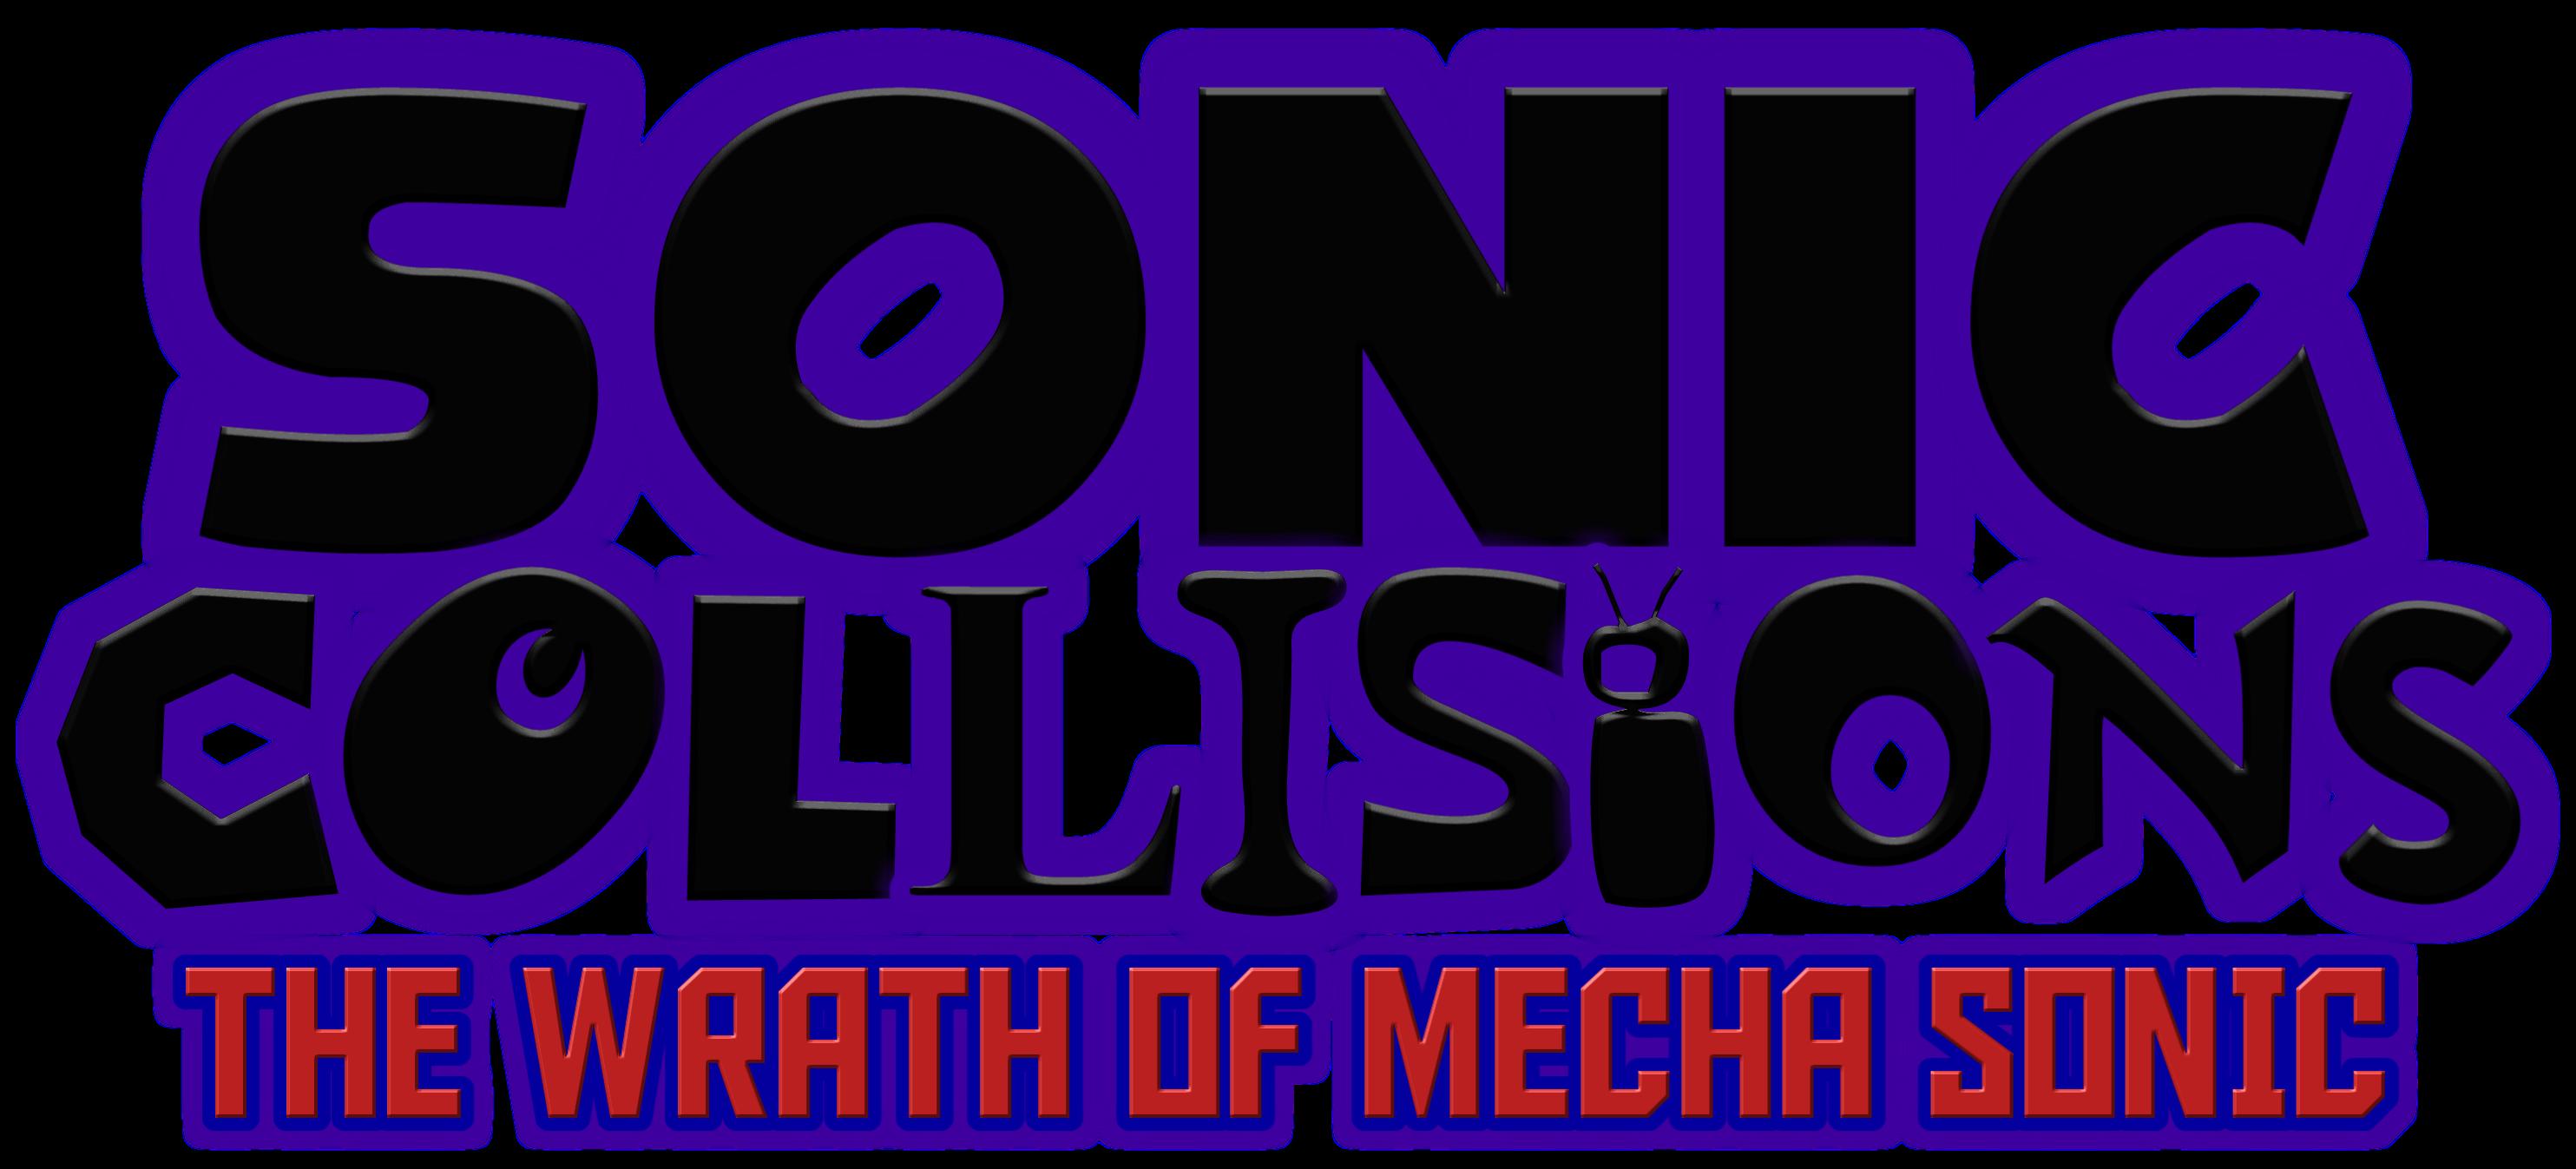 Sonic Collisions: The Wrath of Mecha Sonic